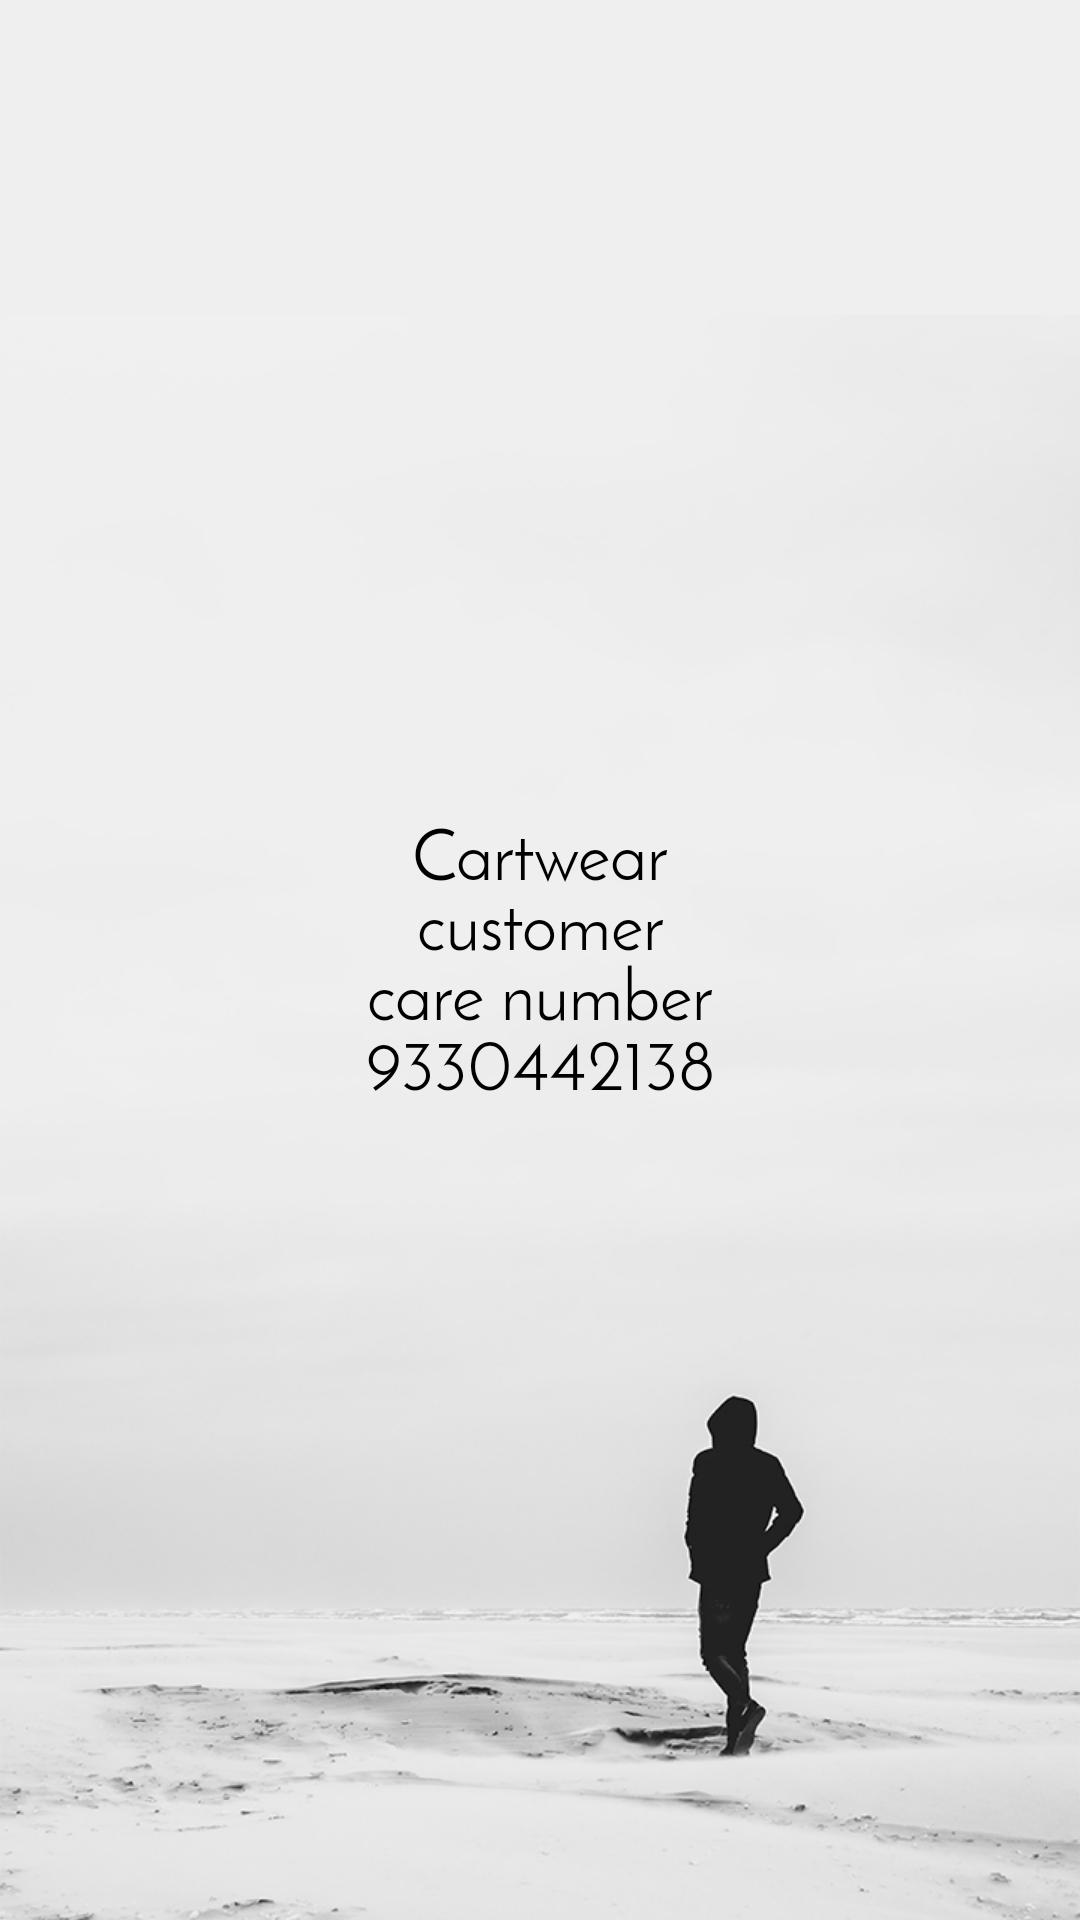 Cartwear customer care number 9330442138